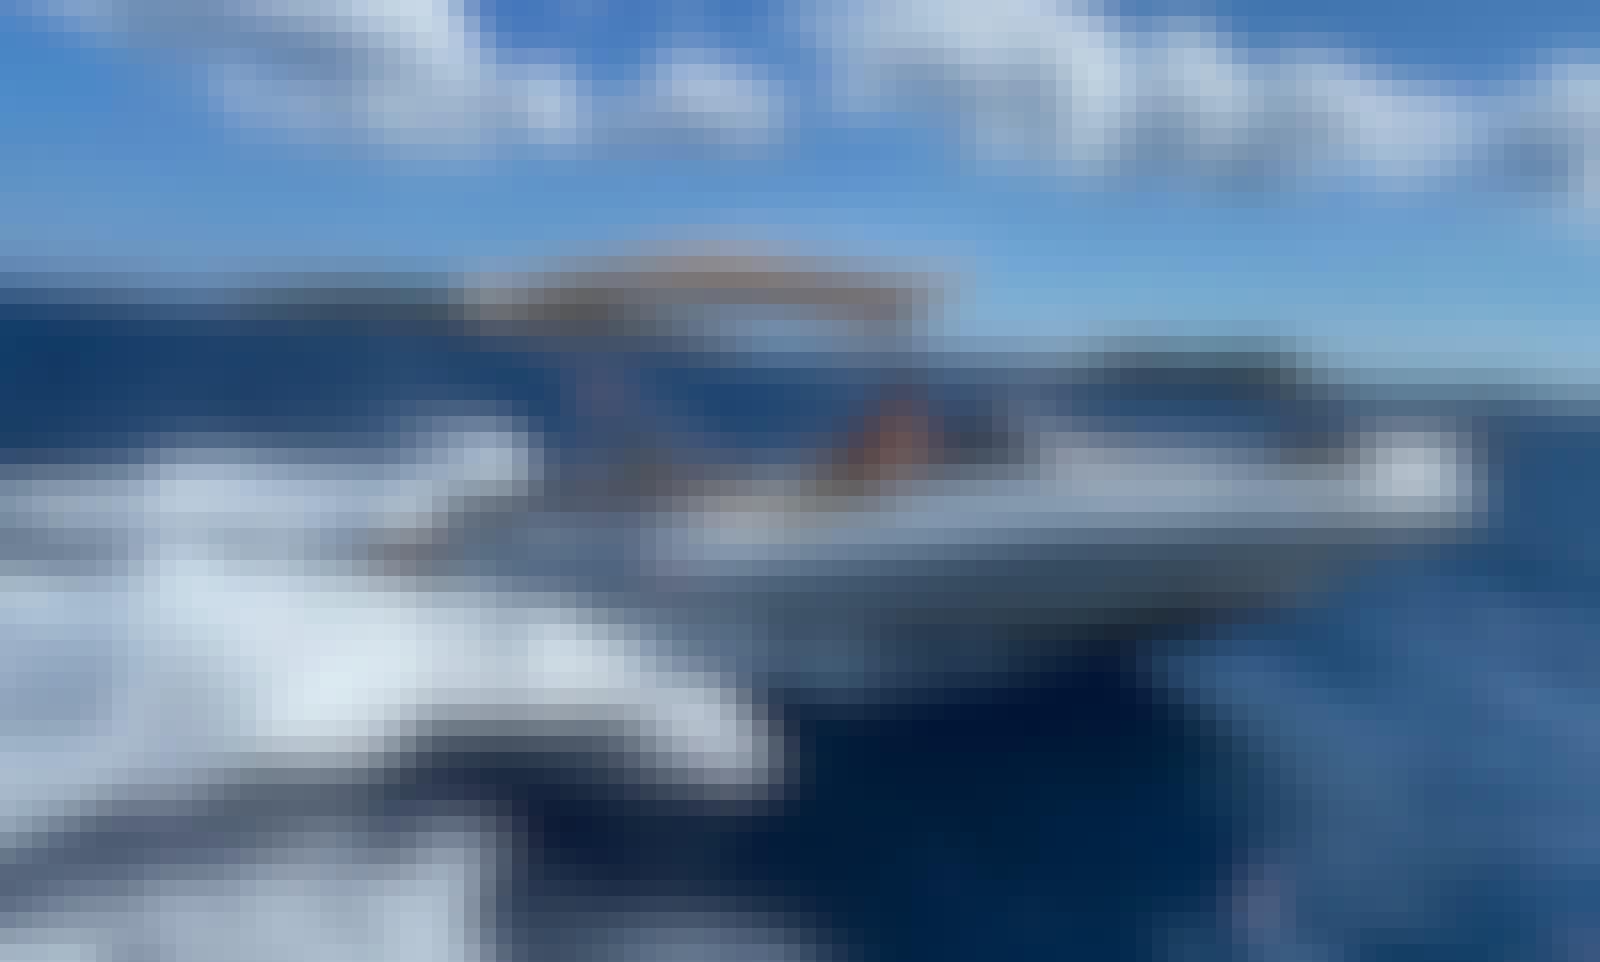 Marlin 24 SR for Rent in Split, Croatia!